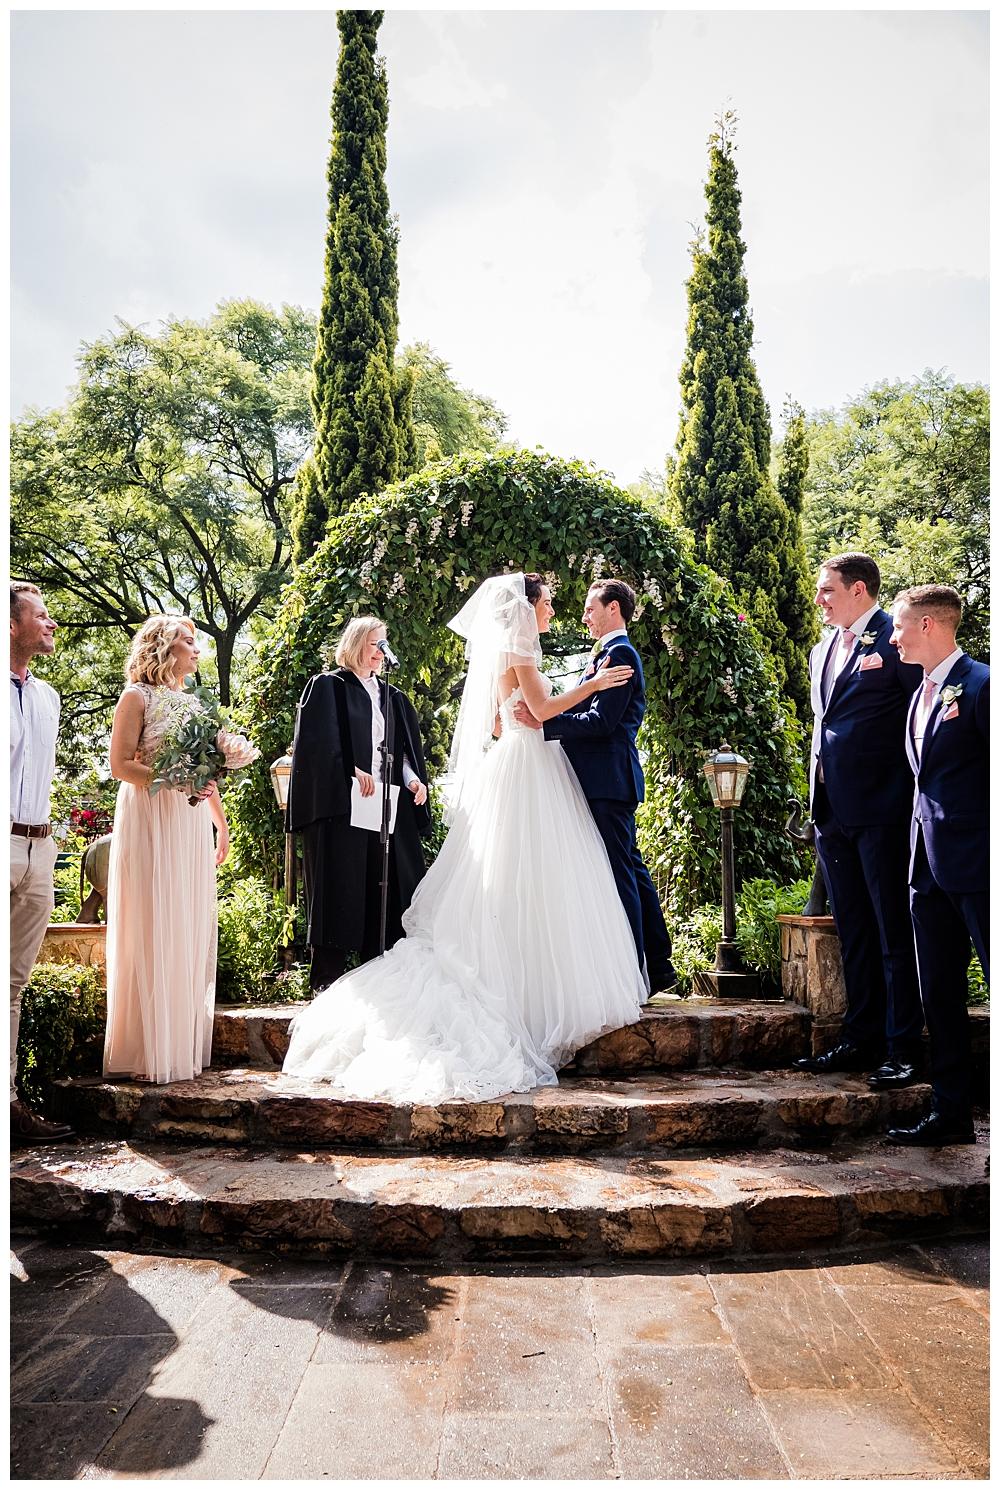 Best_Wedding_Photographer_AlexanderSmith_1256.jpg